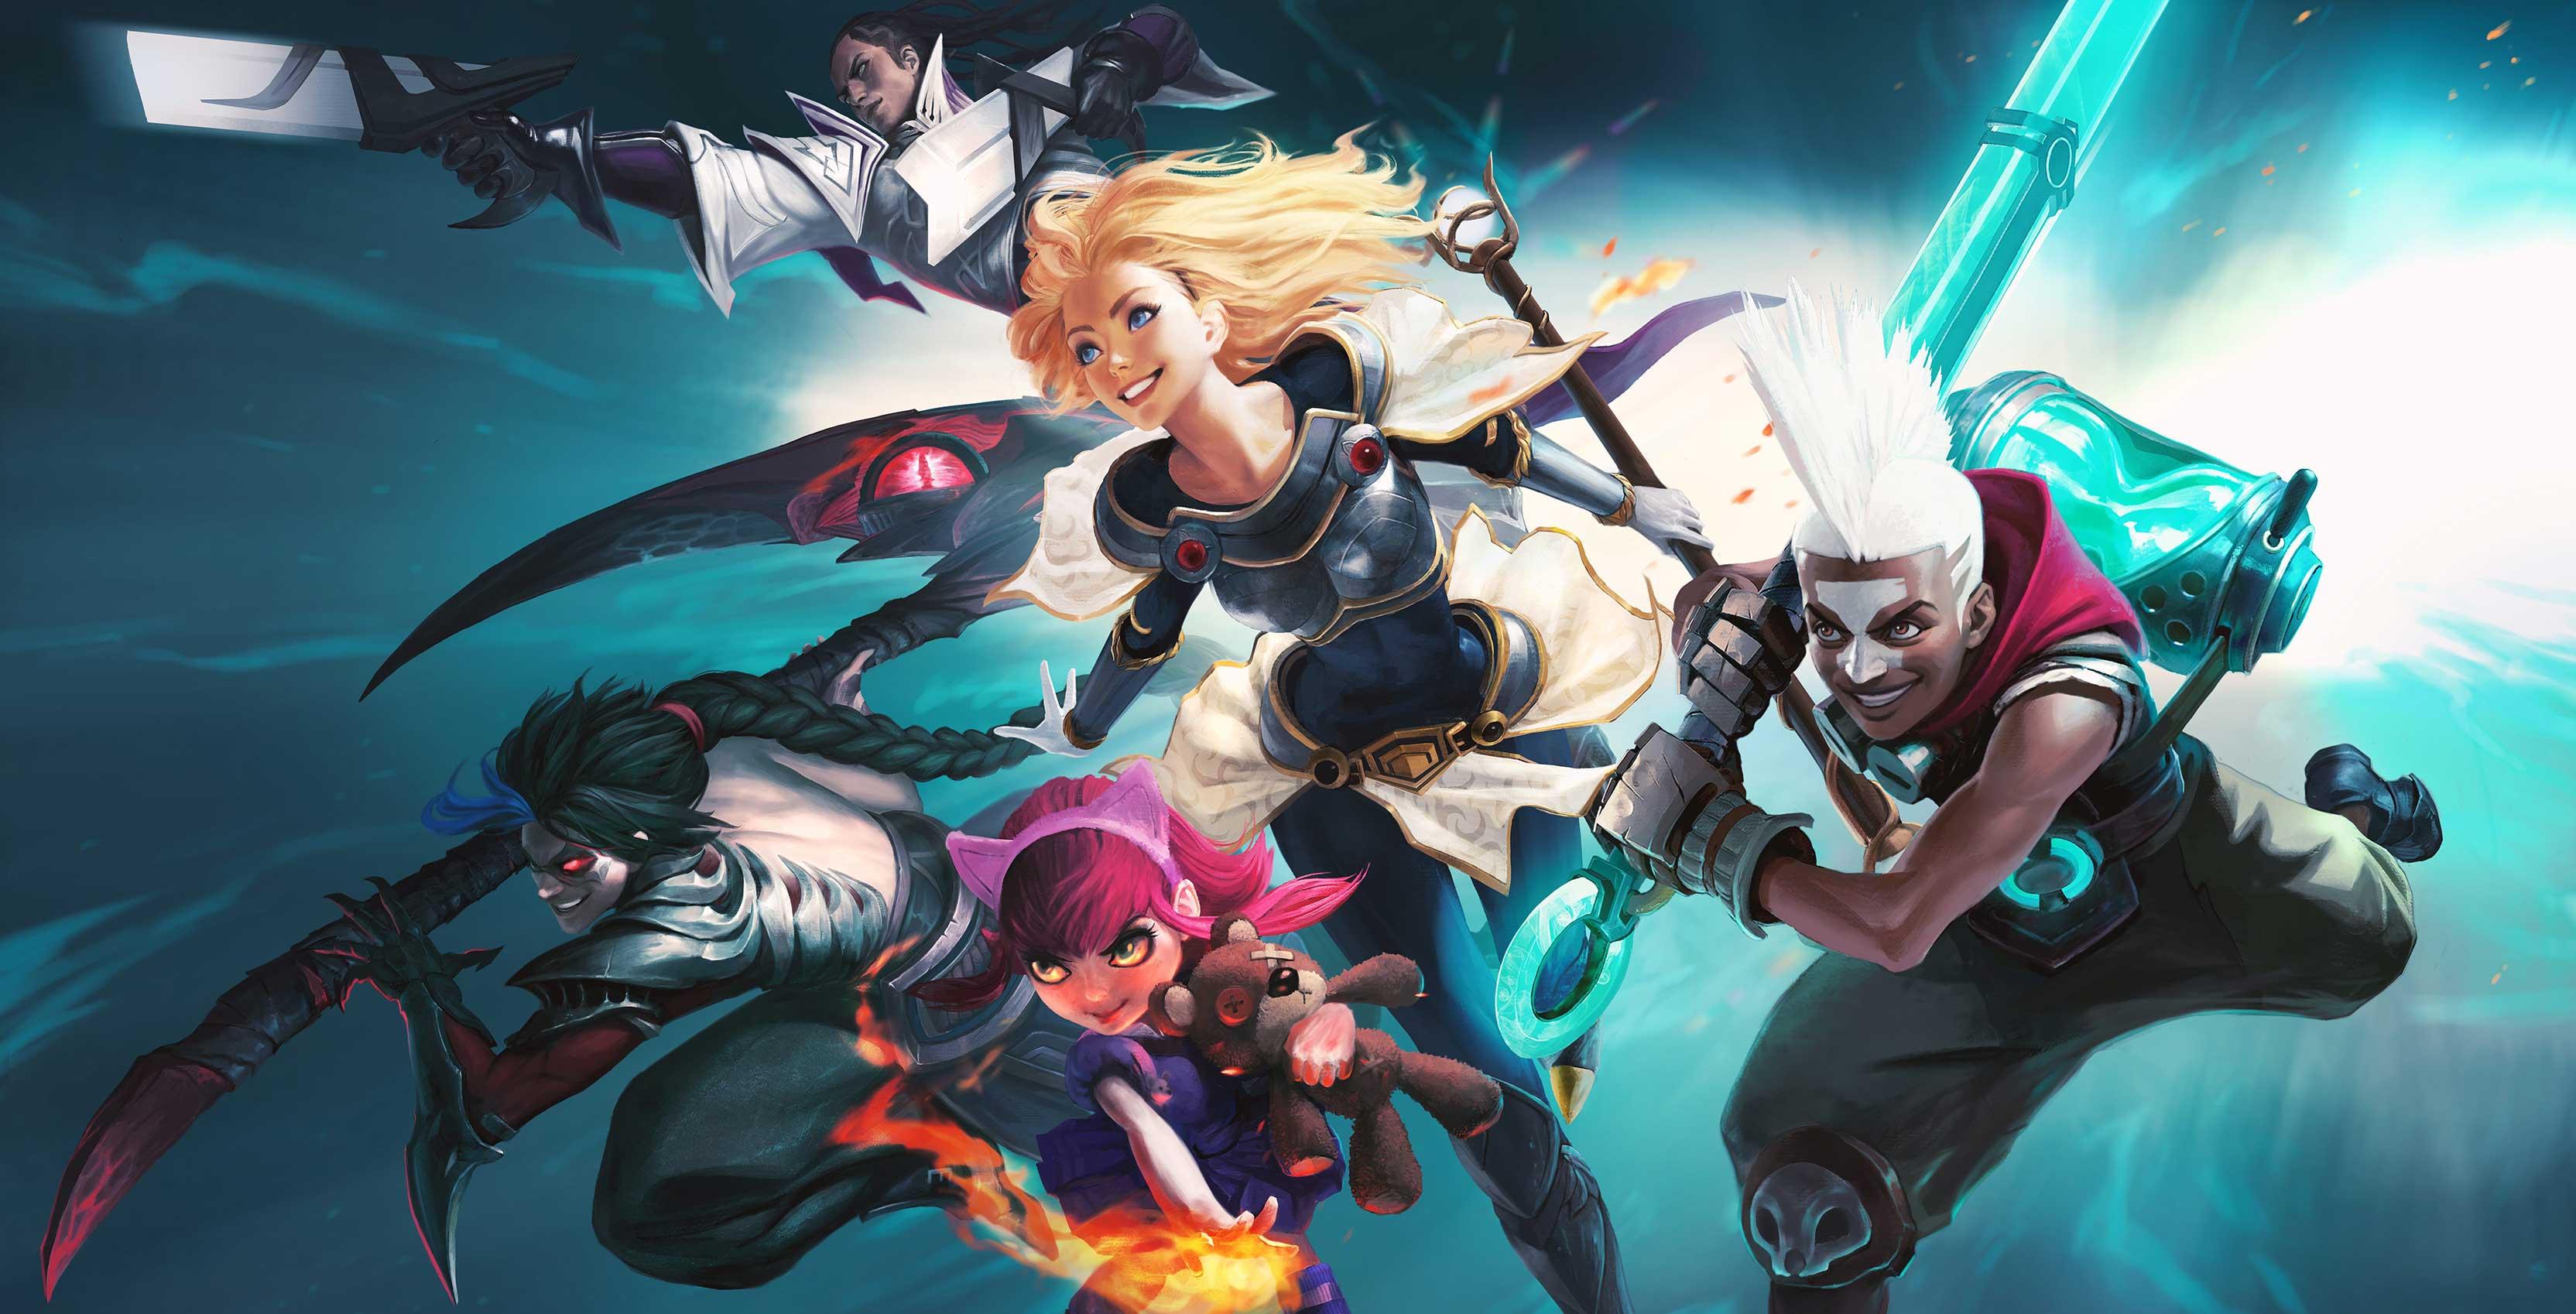 League of Legends character art